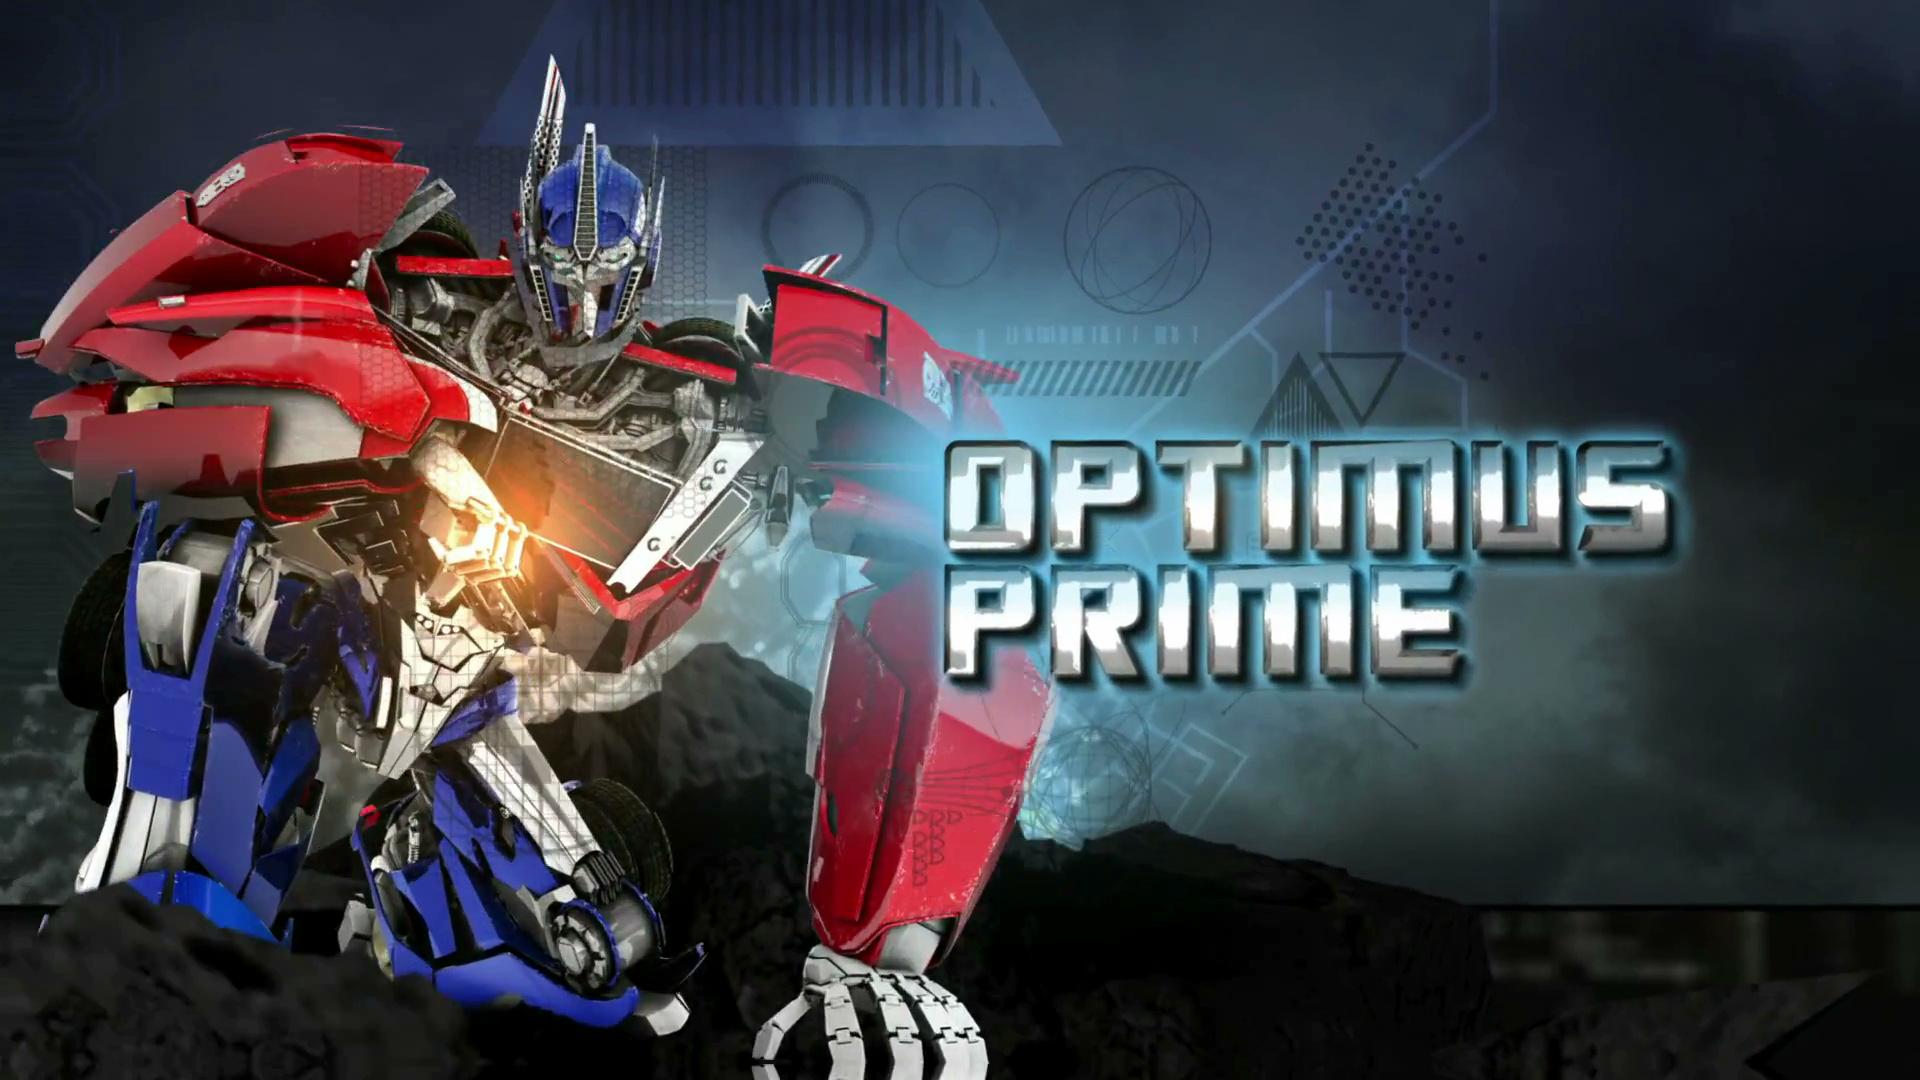 Transformers prime beast hunters season 3 episode 8 thirst youtube.